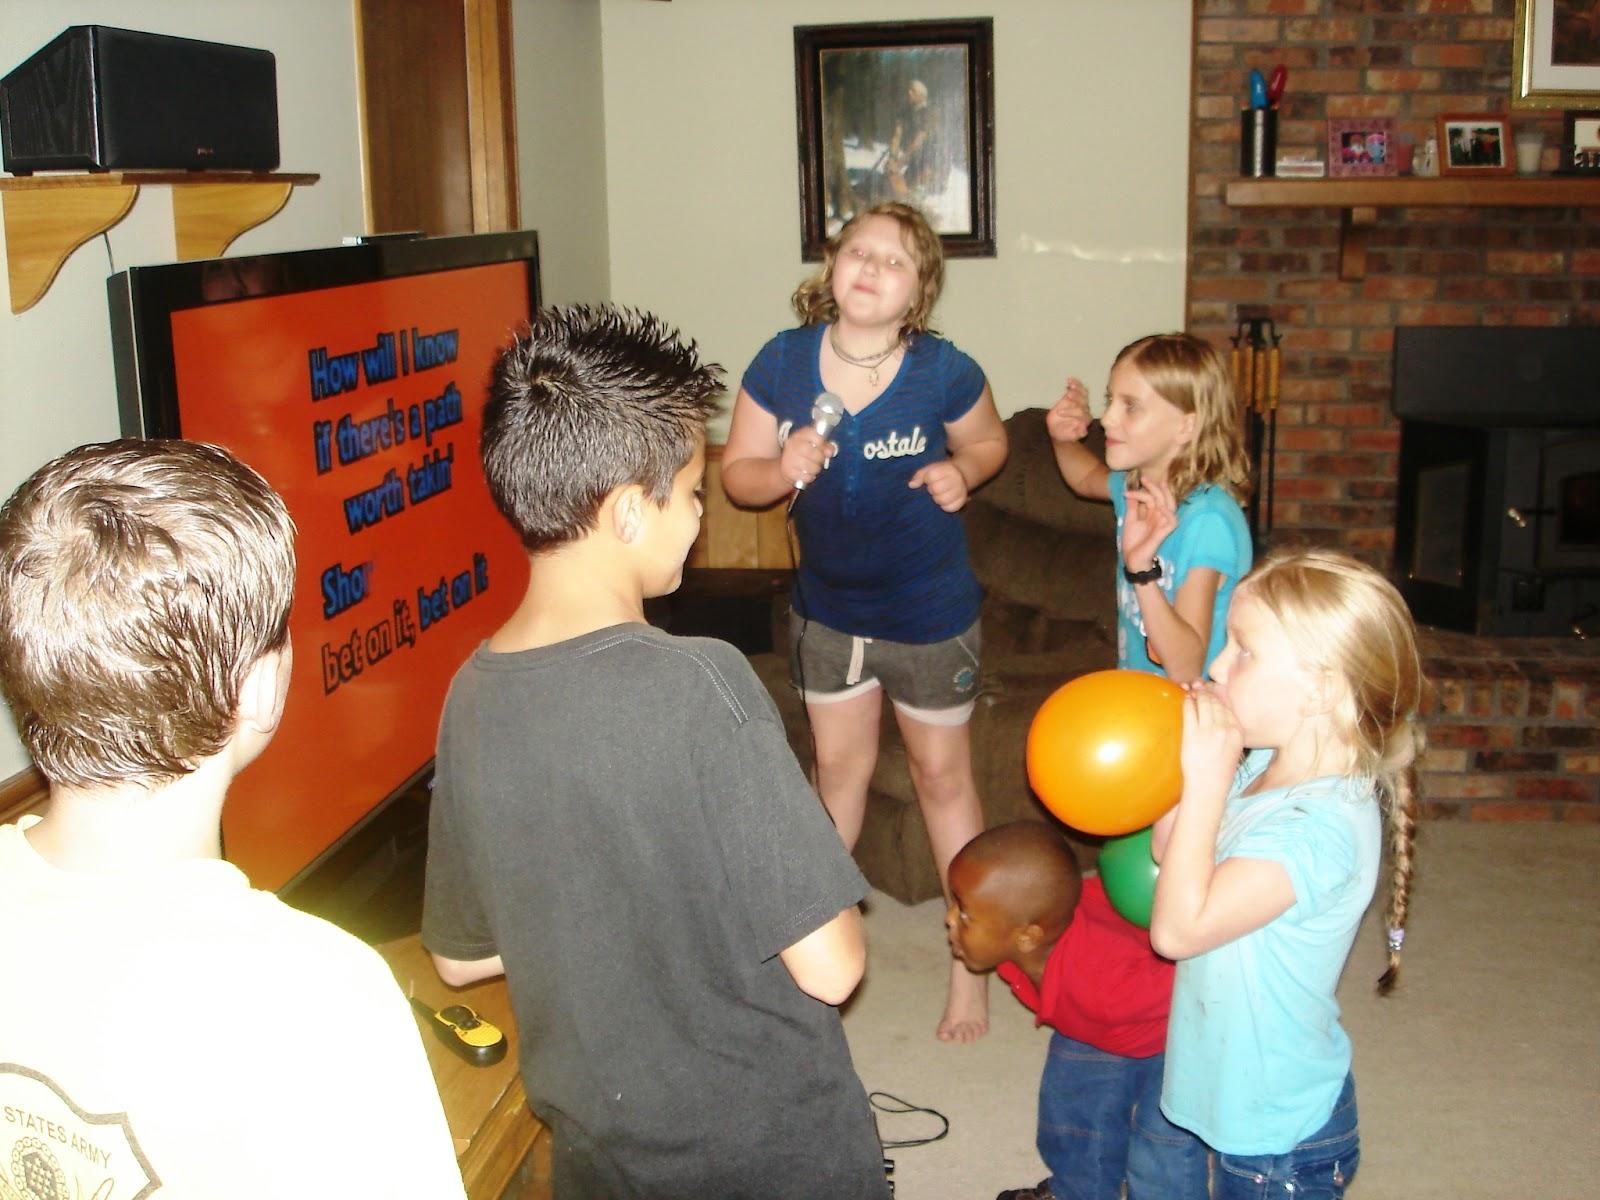 Scene for Sarahs 11th birthday party. - YouTube